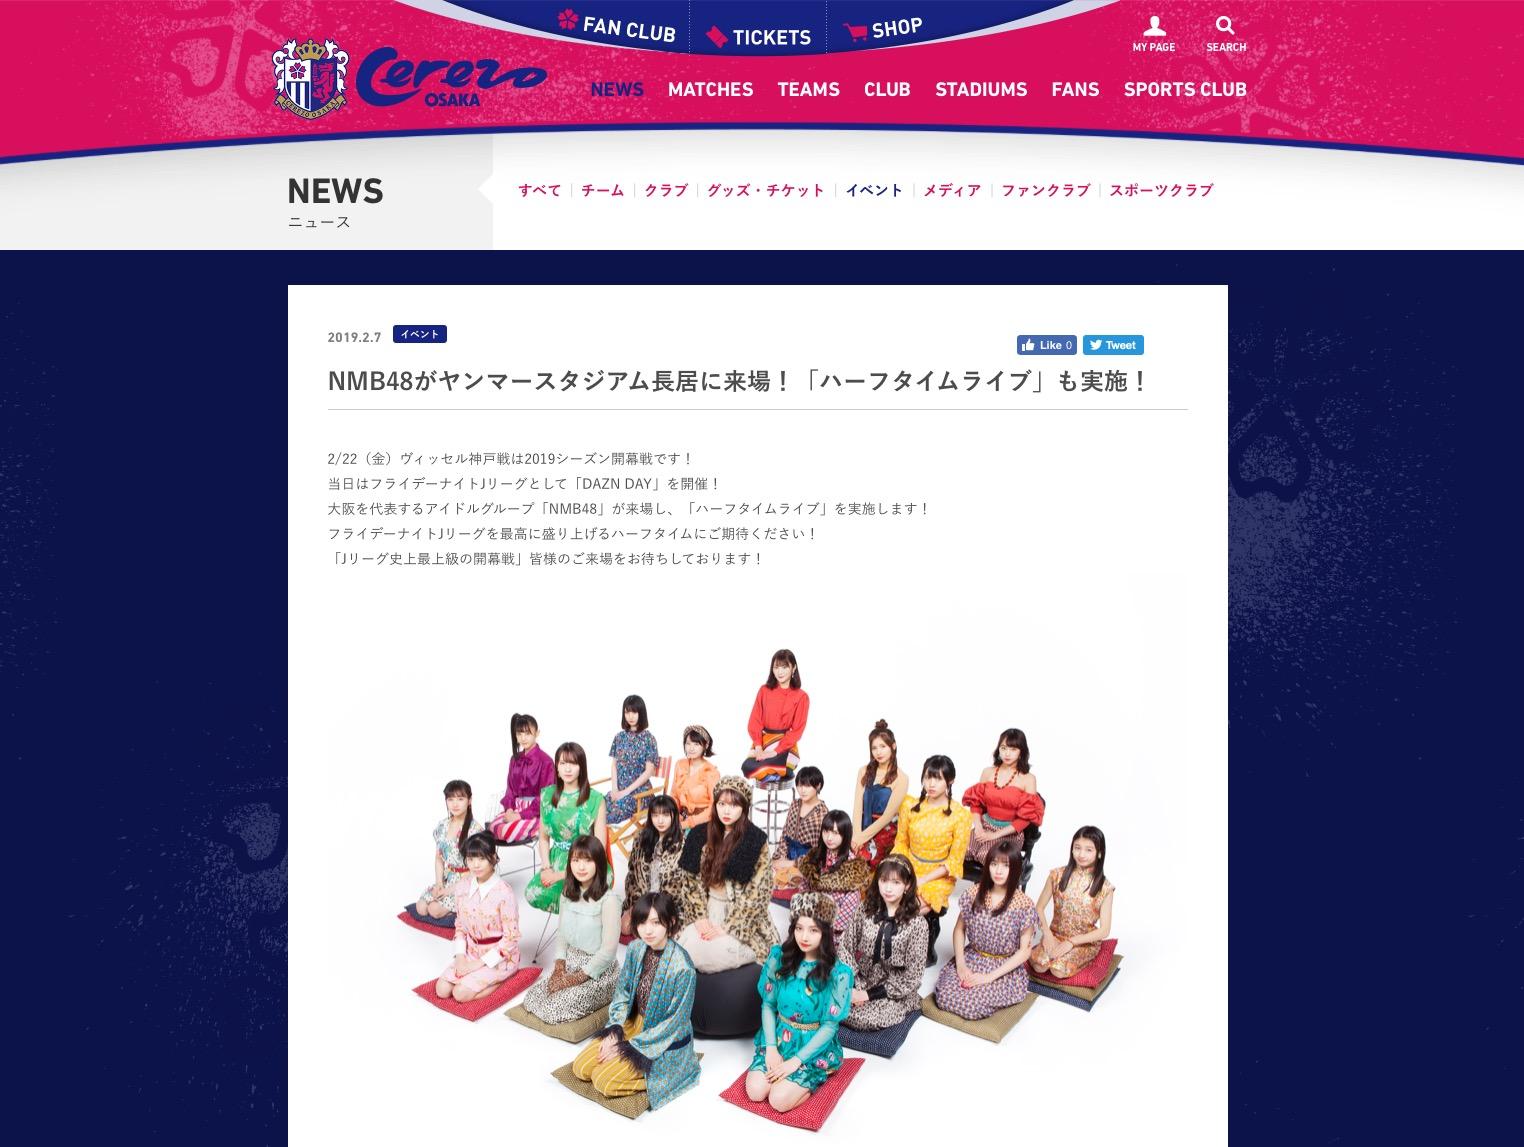 【NMB48】2月22日のJリーグ開幕戦「セレッソ大阪vsヴィッセル神戸」のハーフタイムライブに出演。